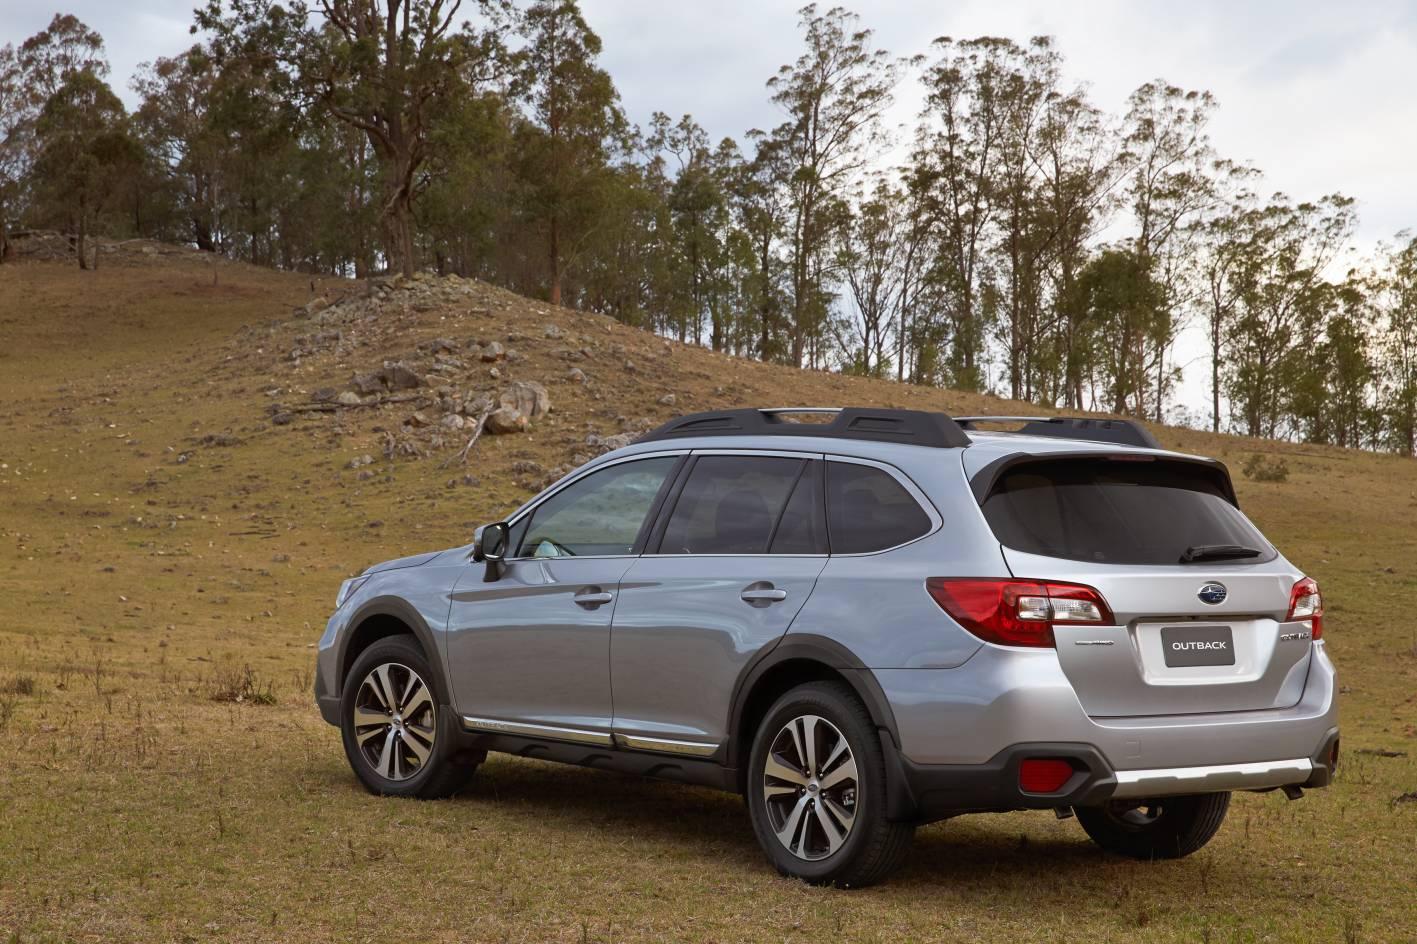 Subaru Outback 3.6R - 2